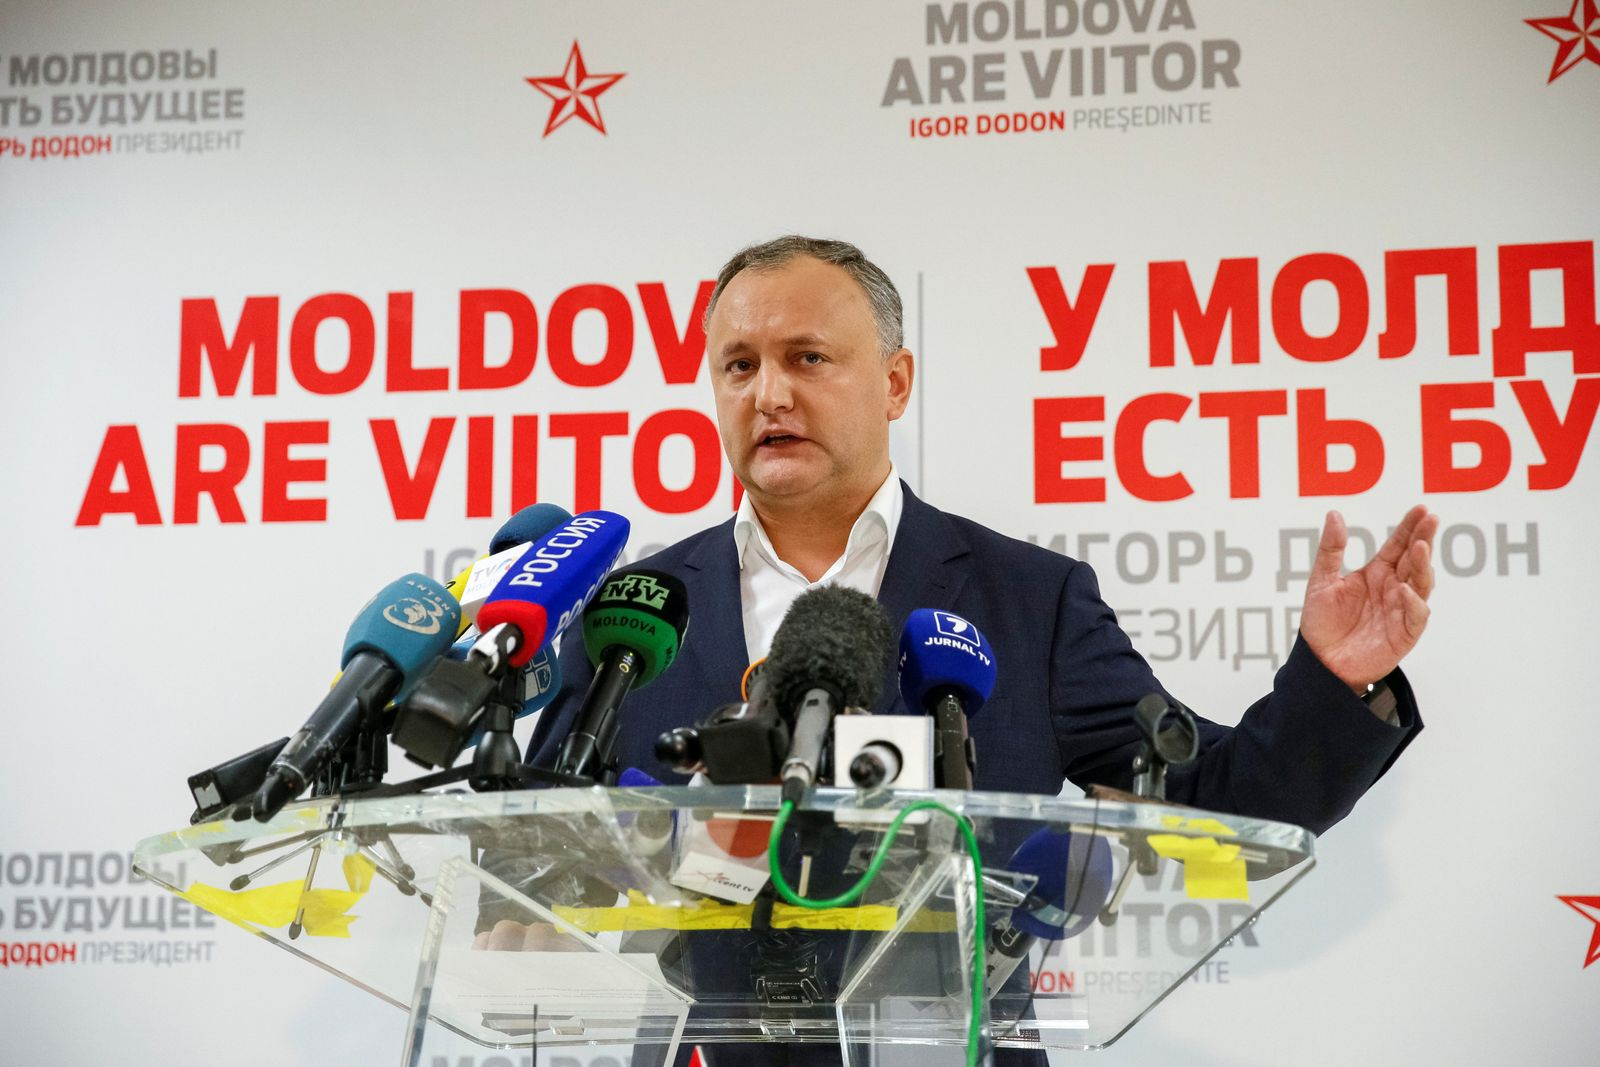 Moldowa / Igor Dodon